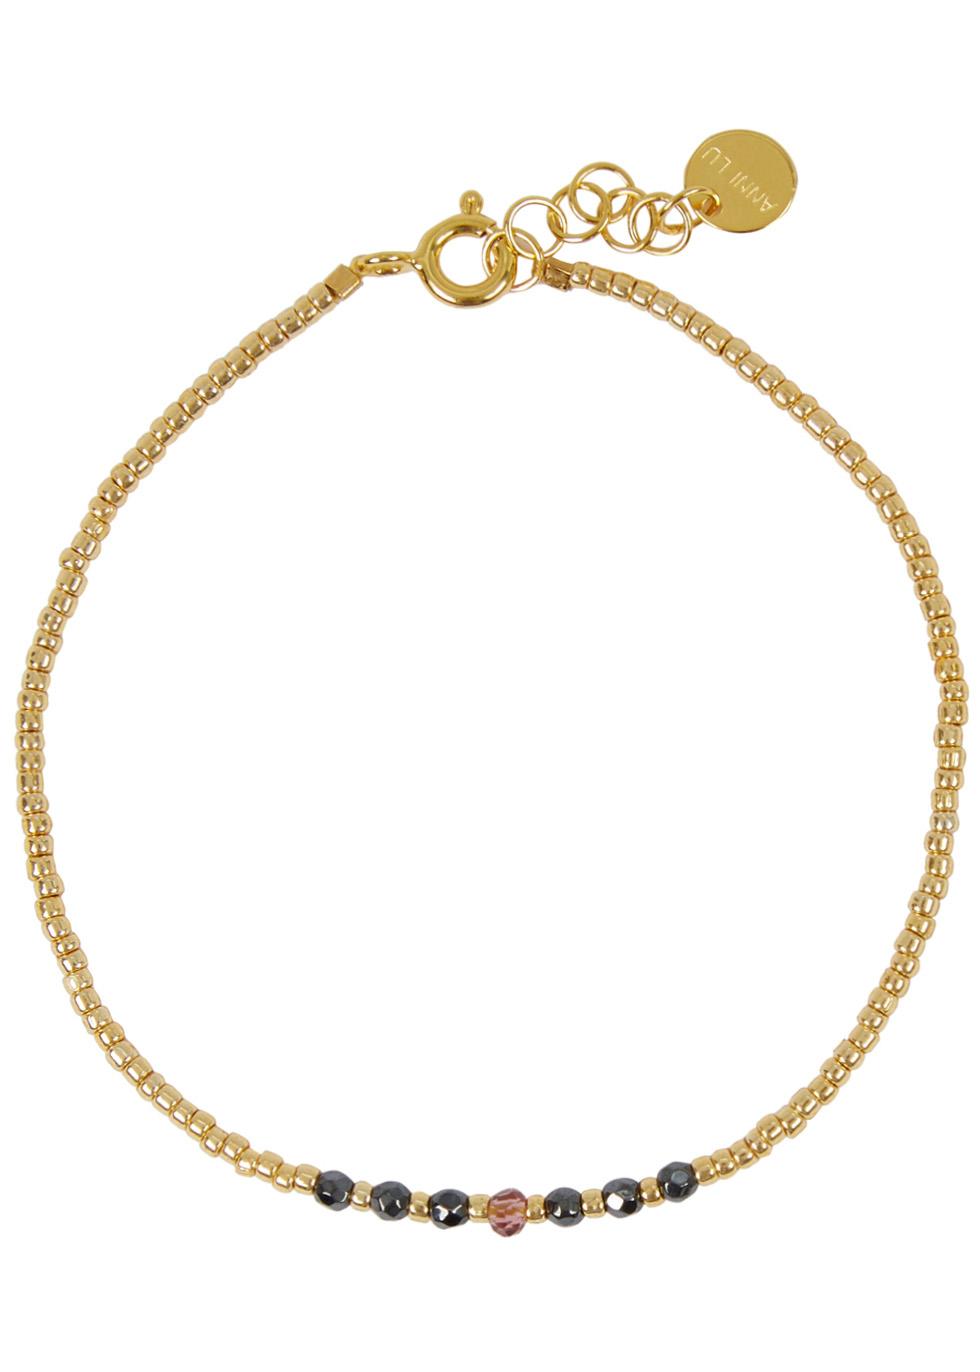 ANNI LU BEAD & GEM 01 18CT GOLD-PLATED BRACELET